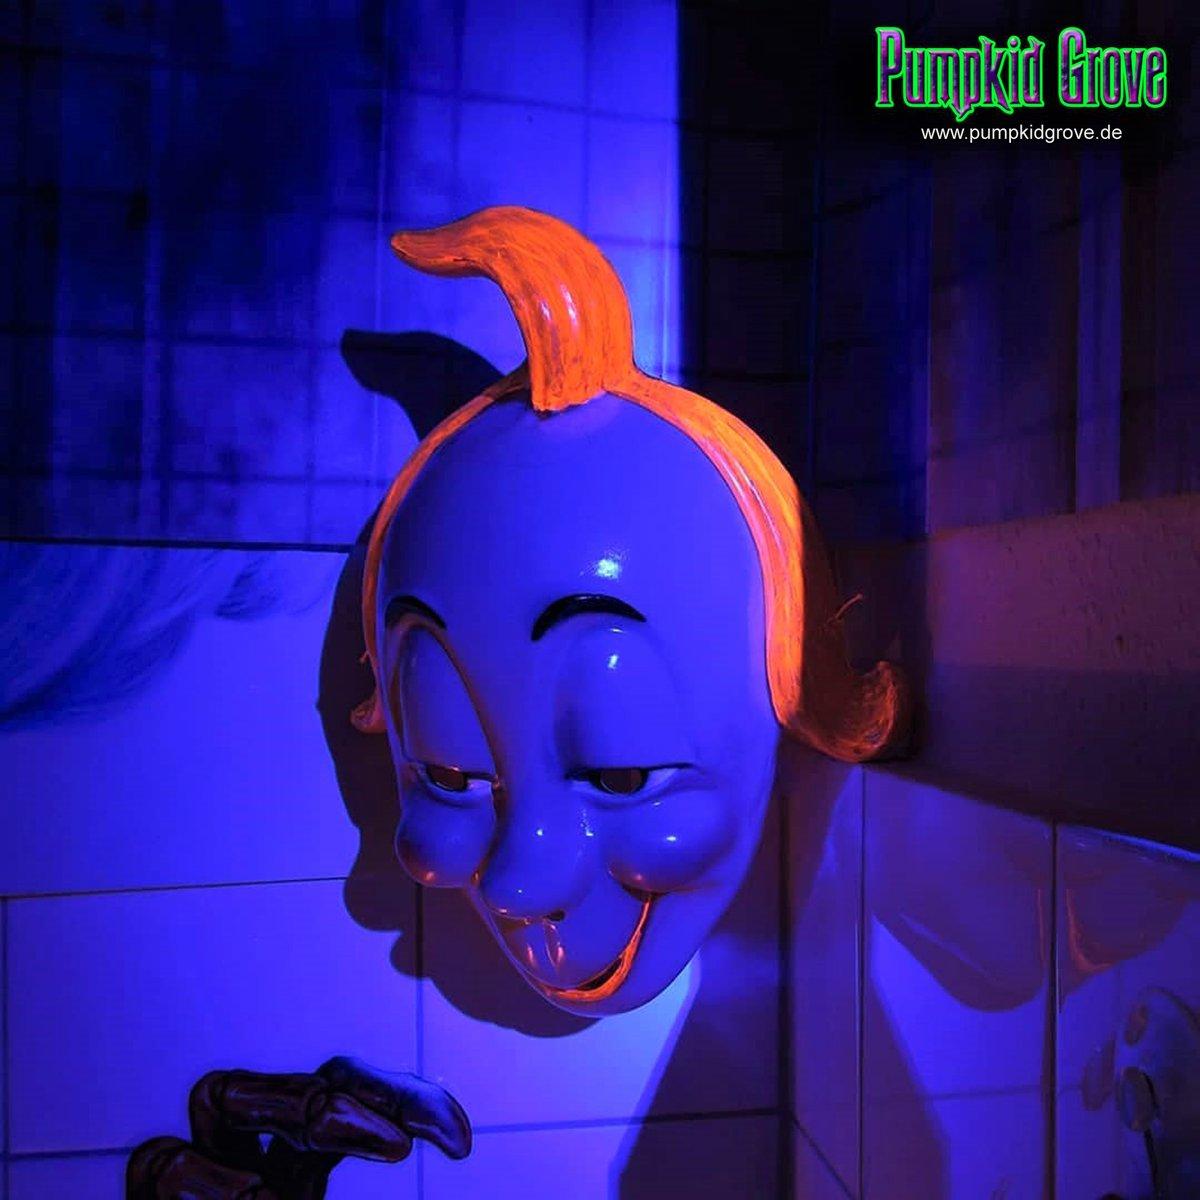 Moritz  #halloween2015 #halloween #samhain #luegburghorrorstory #moritz #ahsfx #asylum #blacklight #thepurge #maske #mask #orange #blau #blue #gruselig #haunted #horror #homehaunt #love #trickortreat #party #art #dekoration #photo #germany #pumpkidgrove #pumpkidgrovegermany https://t.co/J1qY4HWwpg